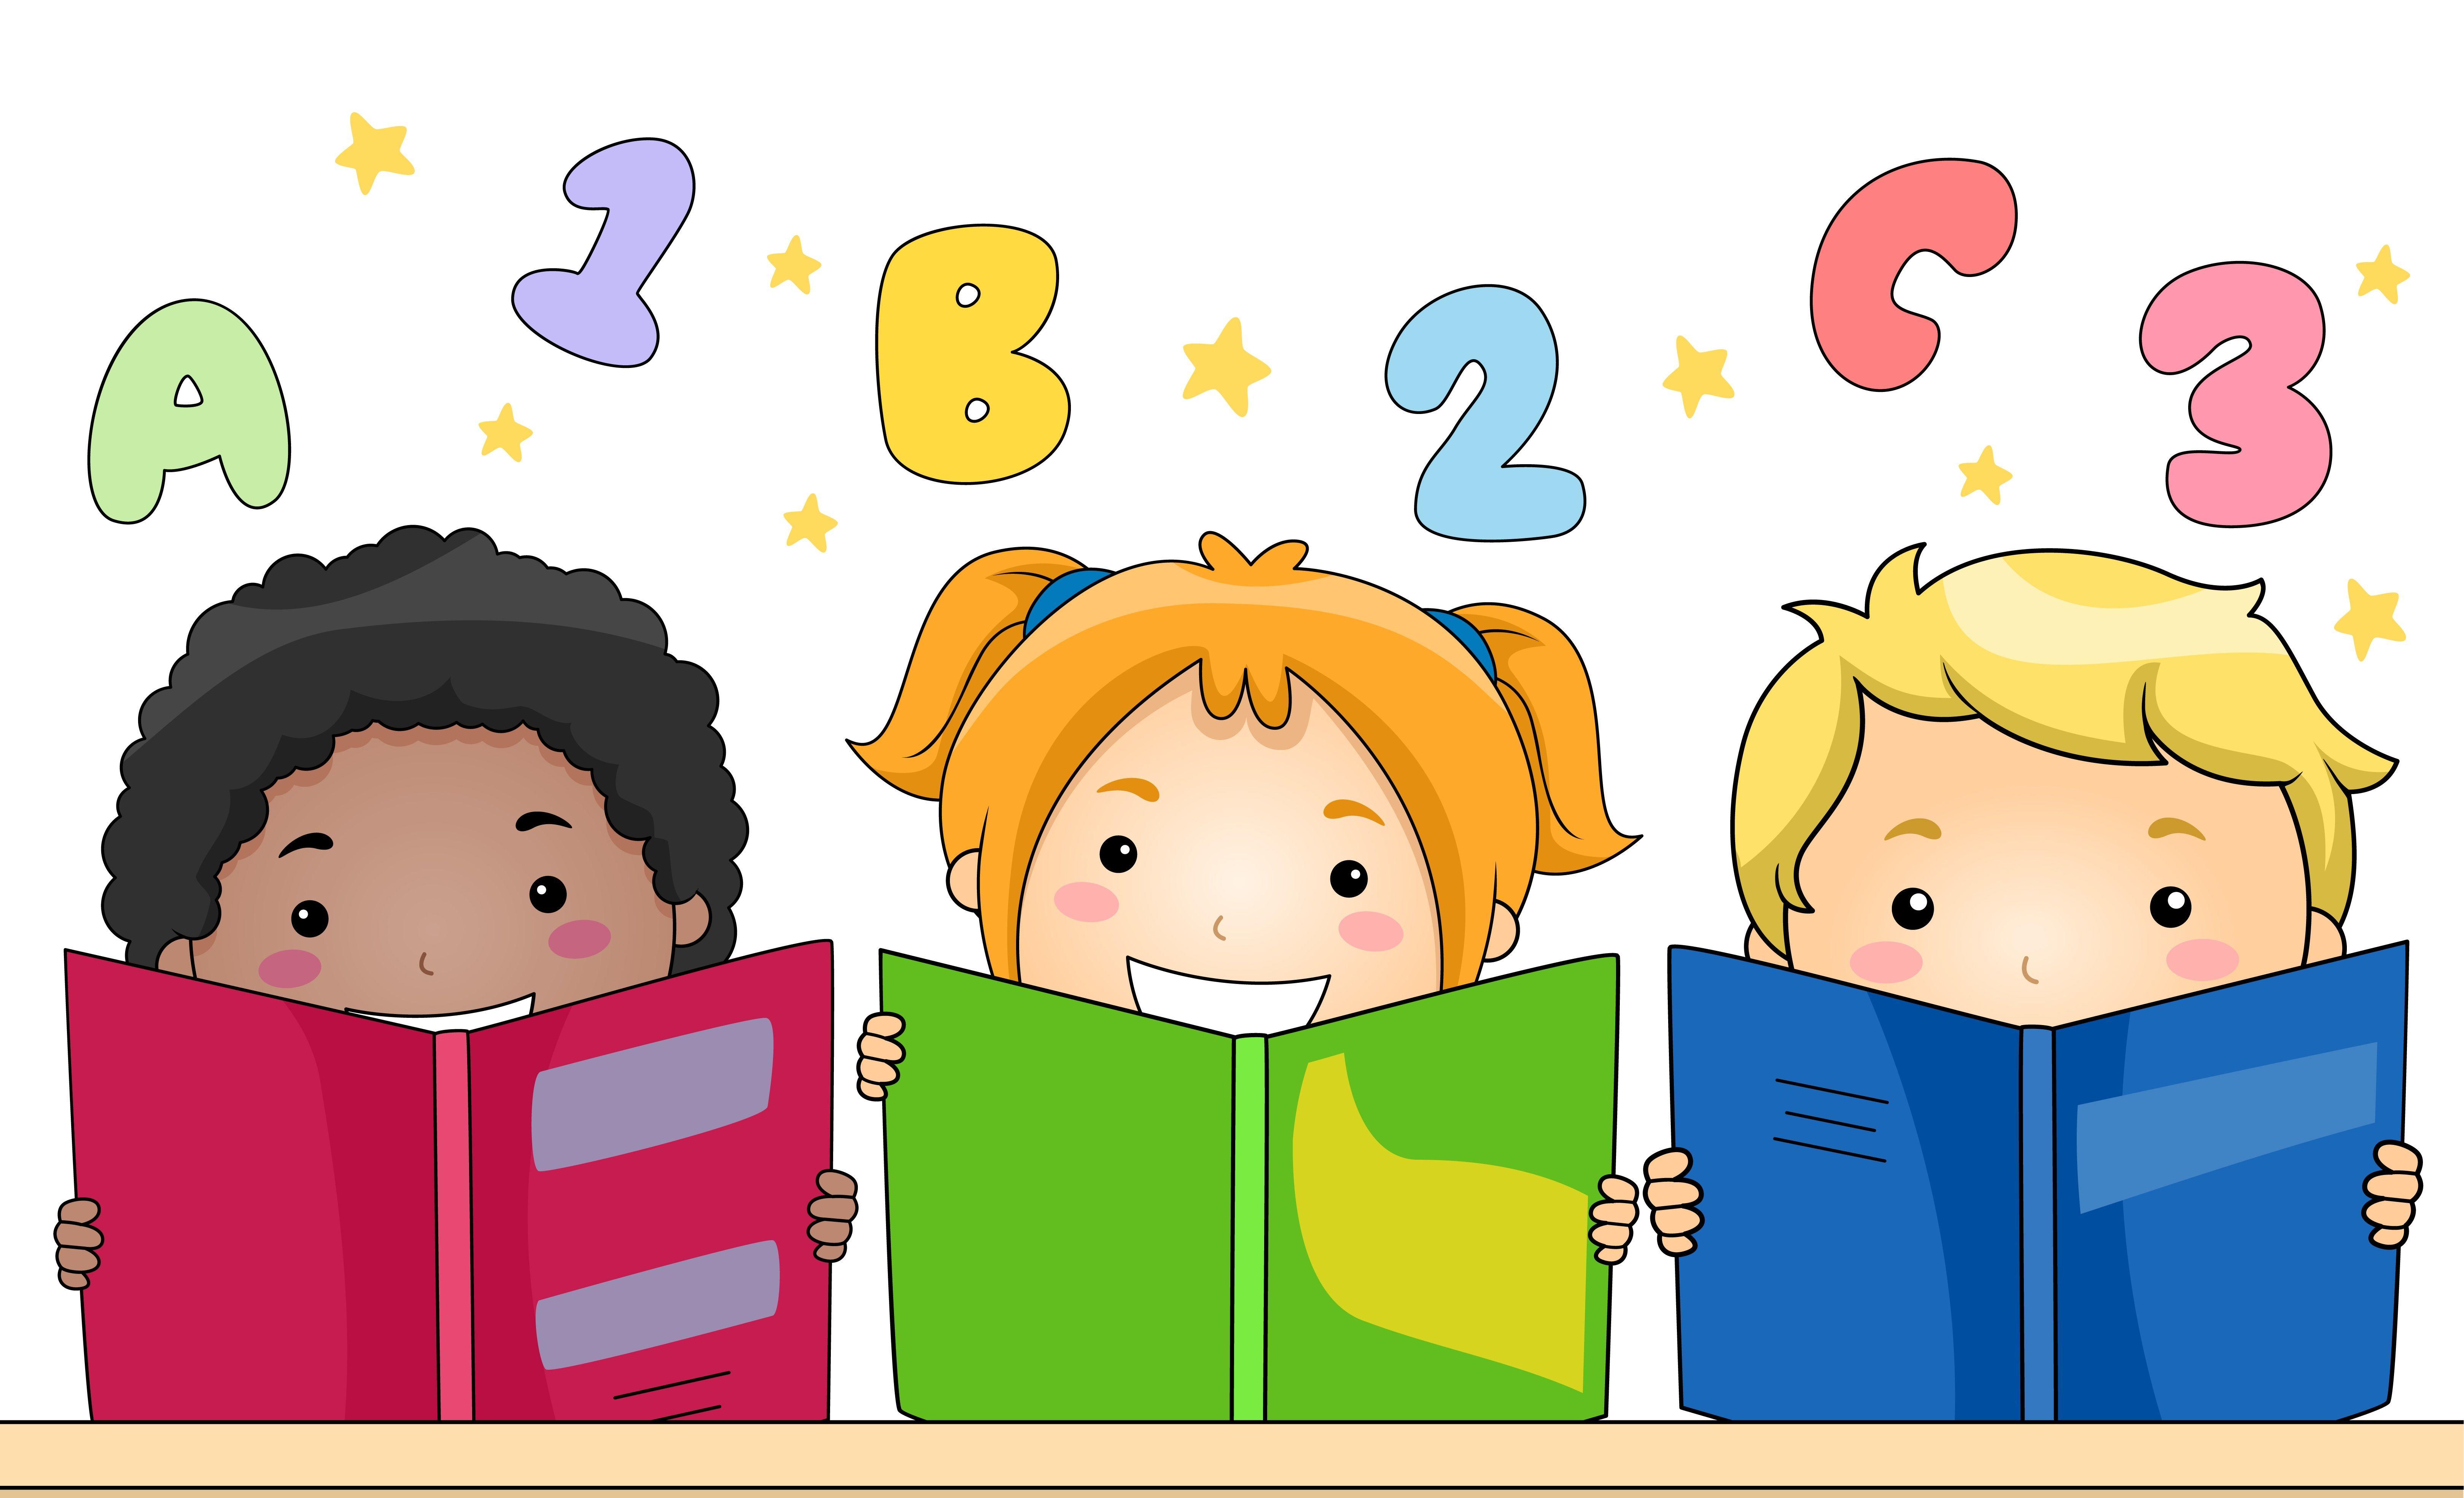 Getting Ready For Kindergarten Tips For Kindergarten Readiness Kids Reading Books Kids Reading Kindergarten Readiness